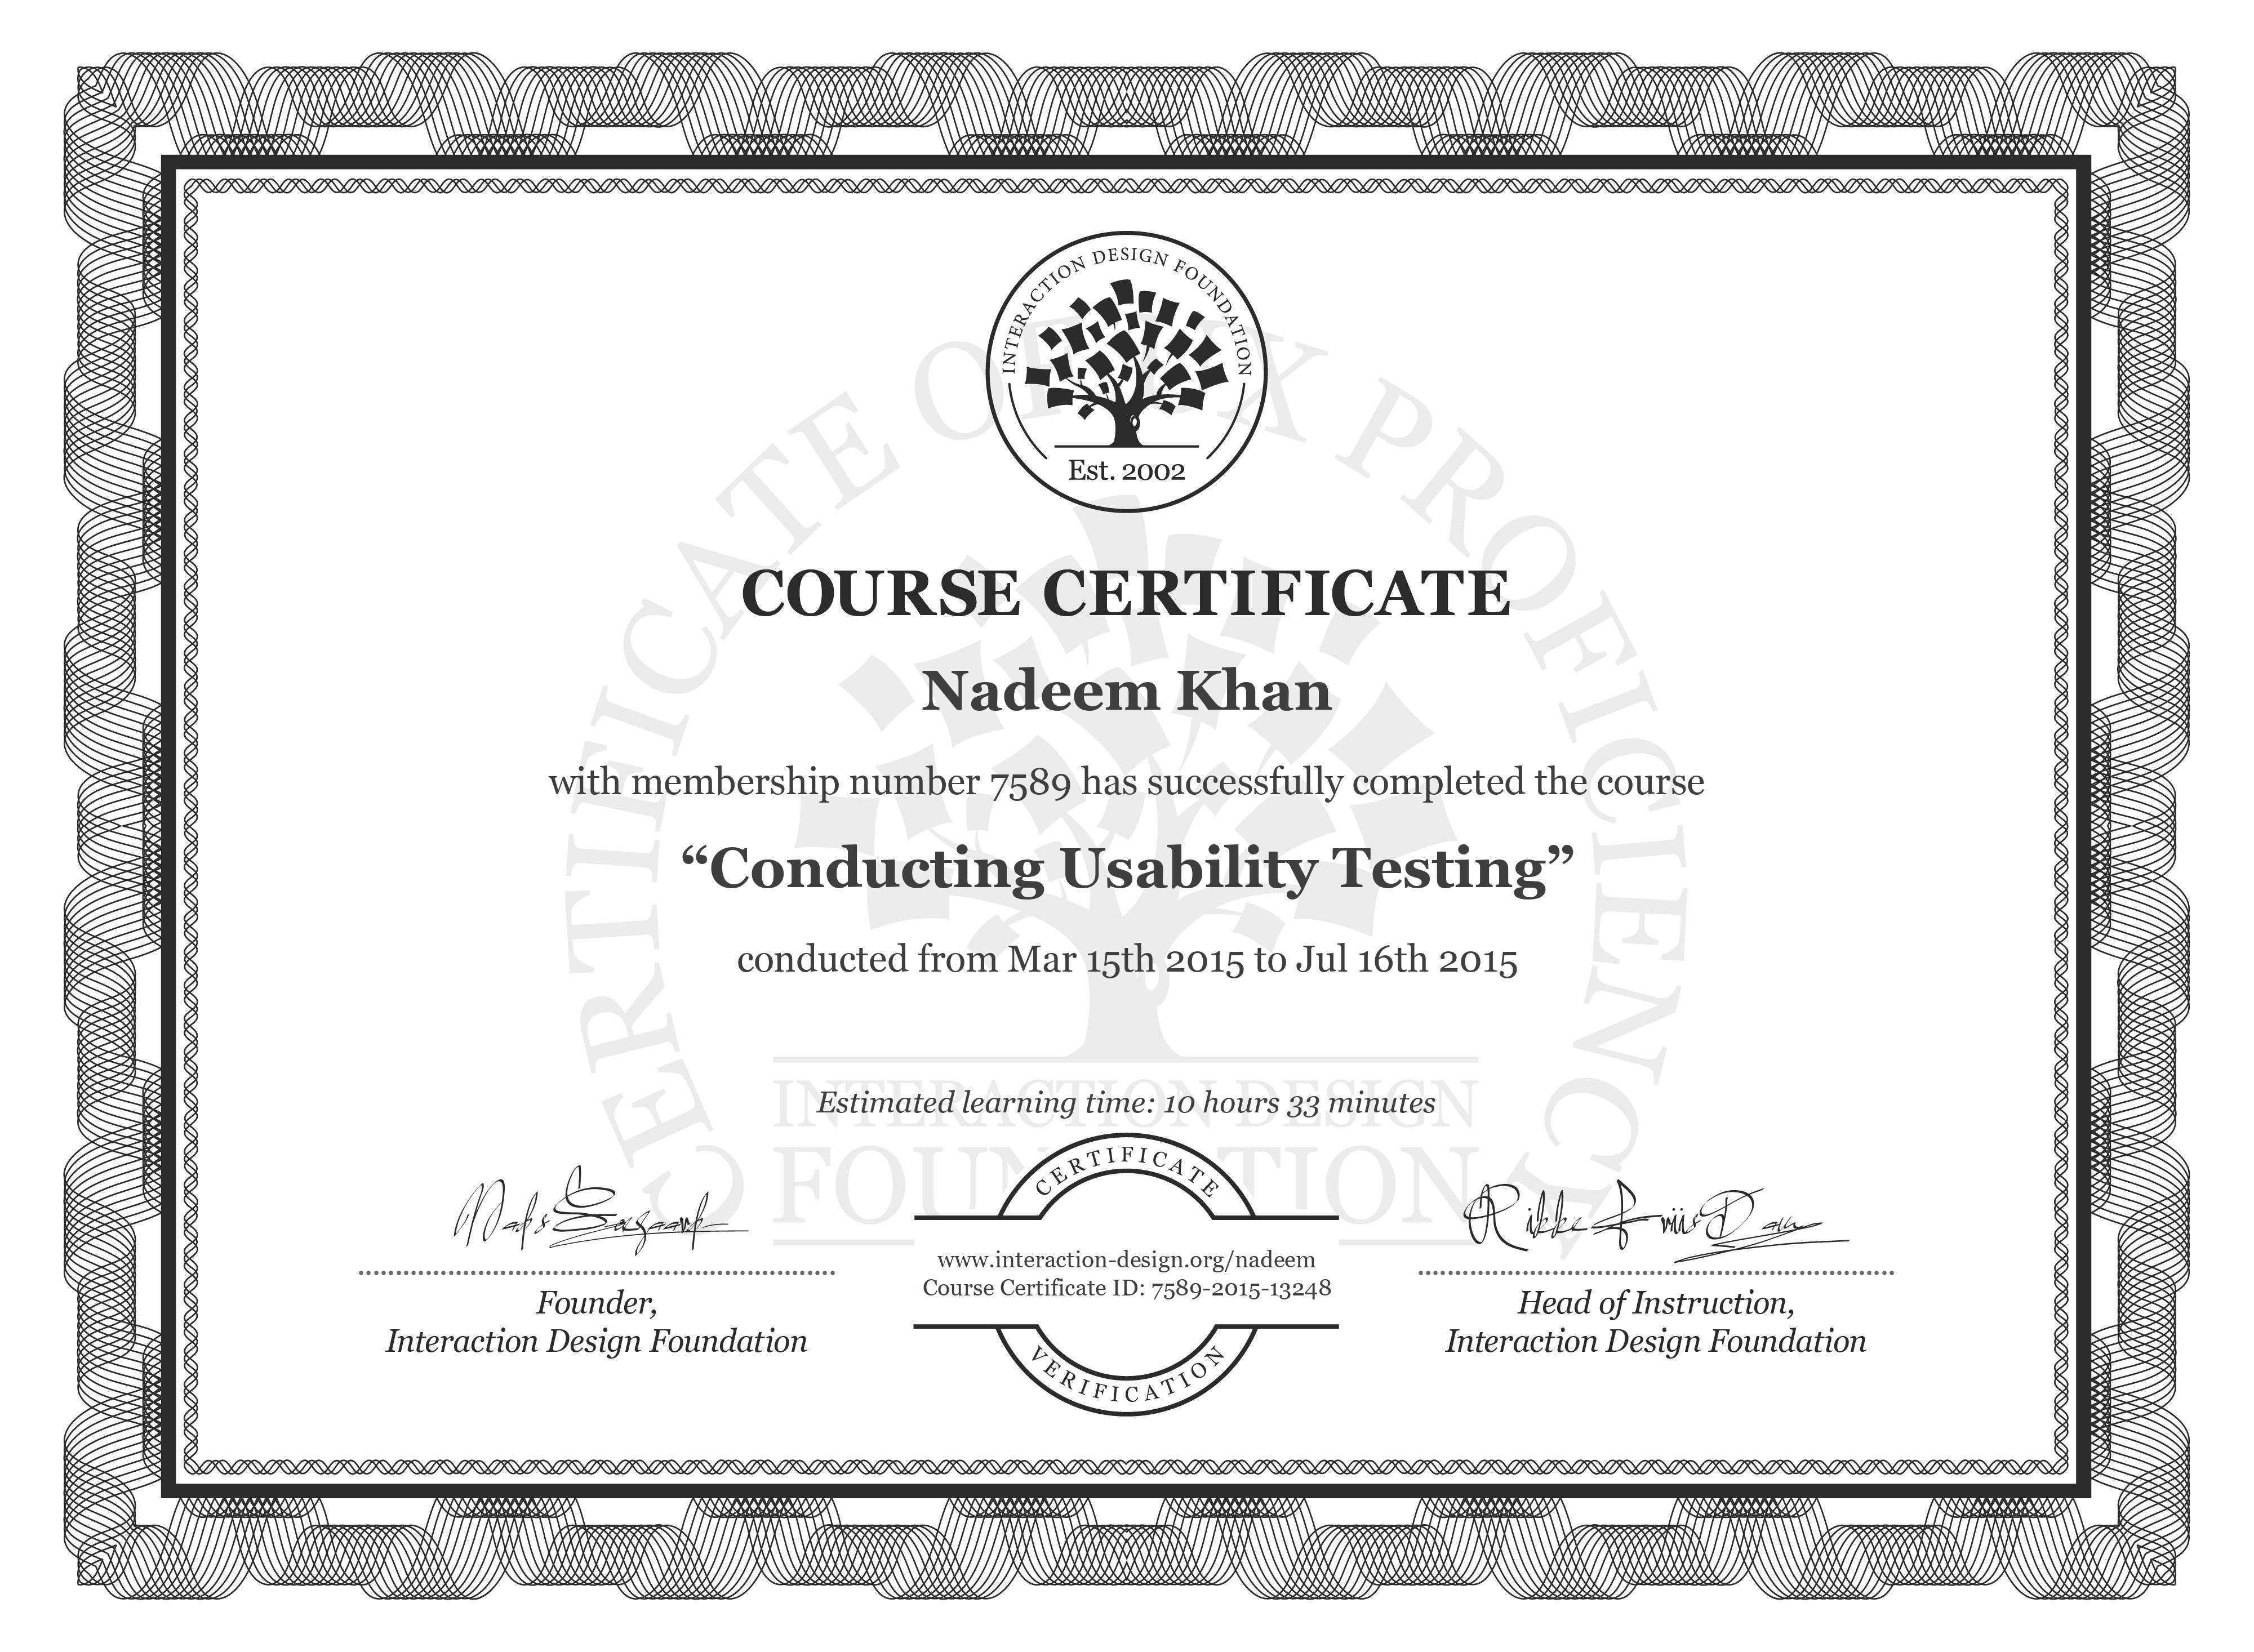 Nadeem Khan: Course Certificate - Conducting Usability Testing